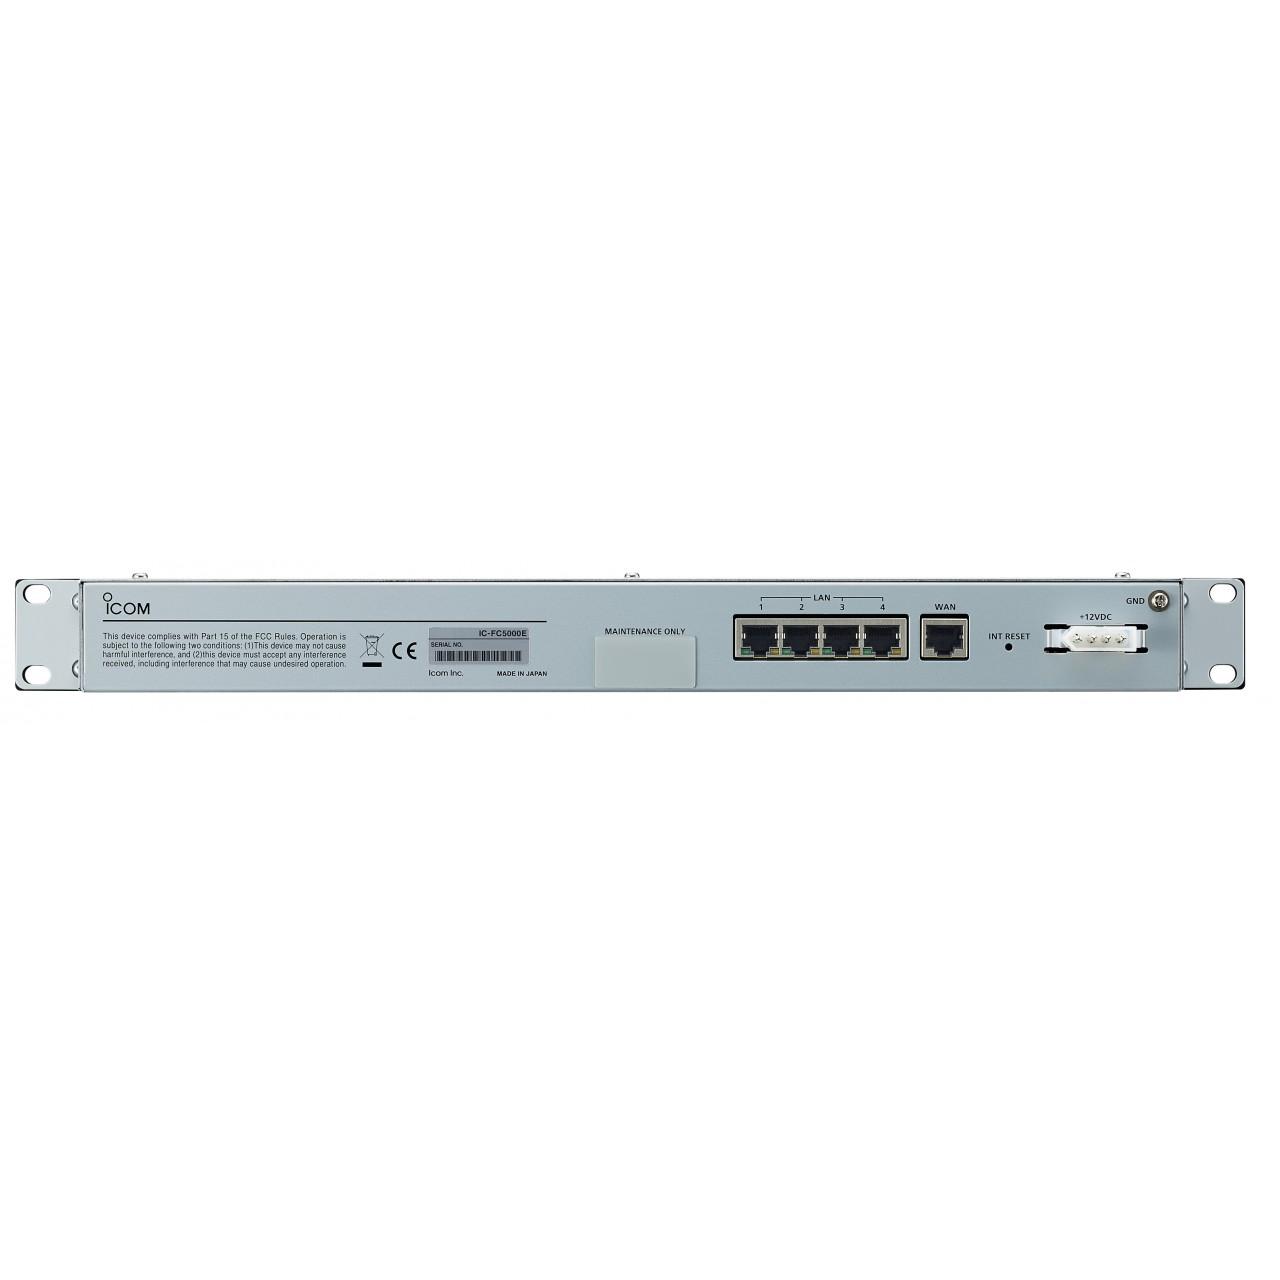 IC-FC5000E Autres - ICOM